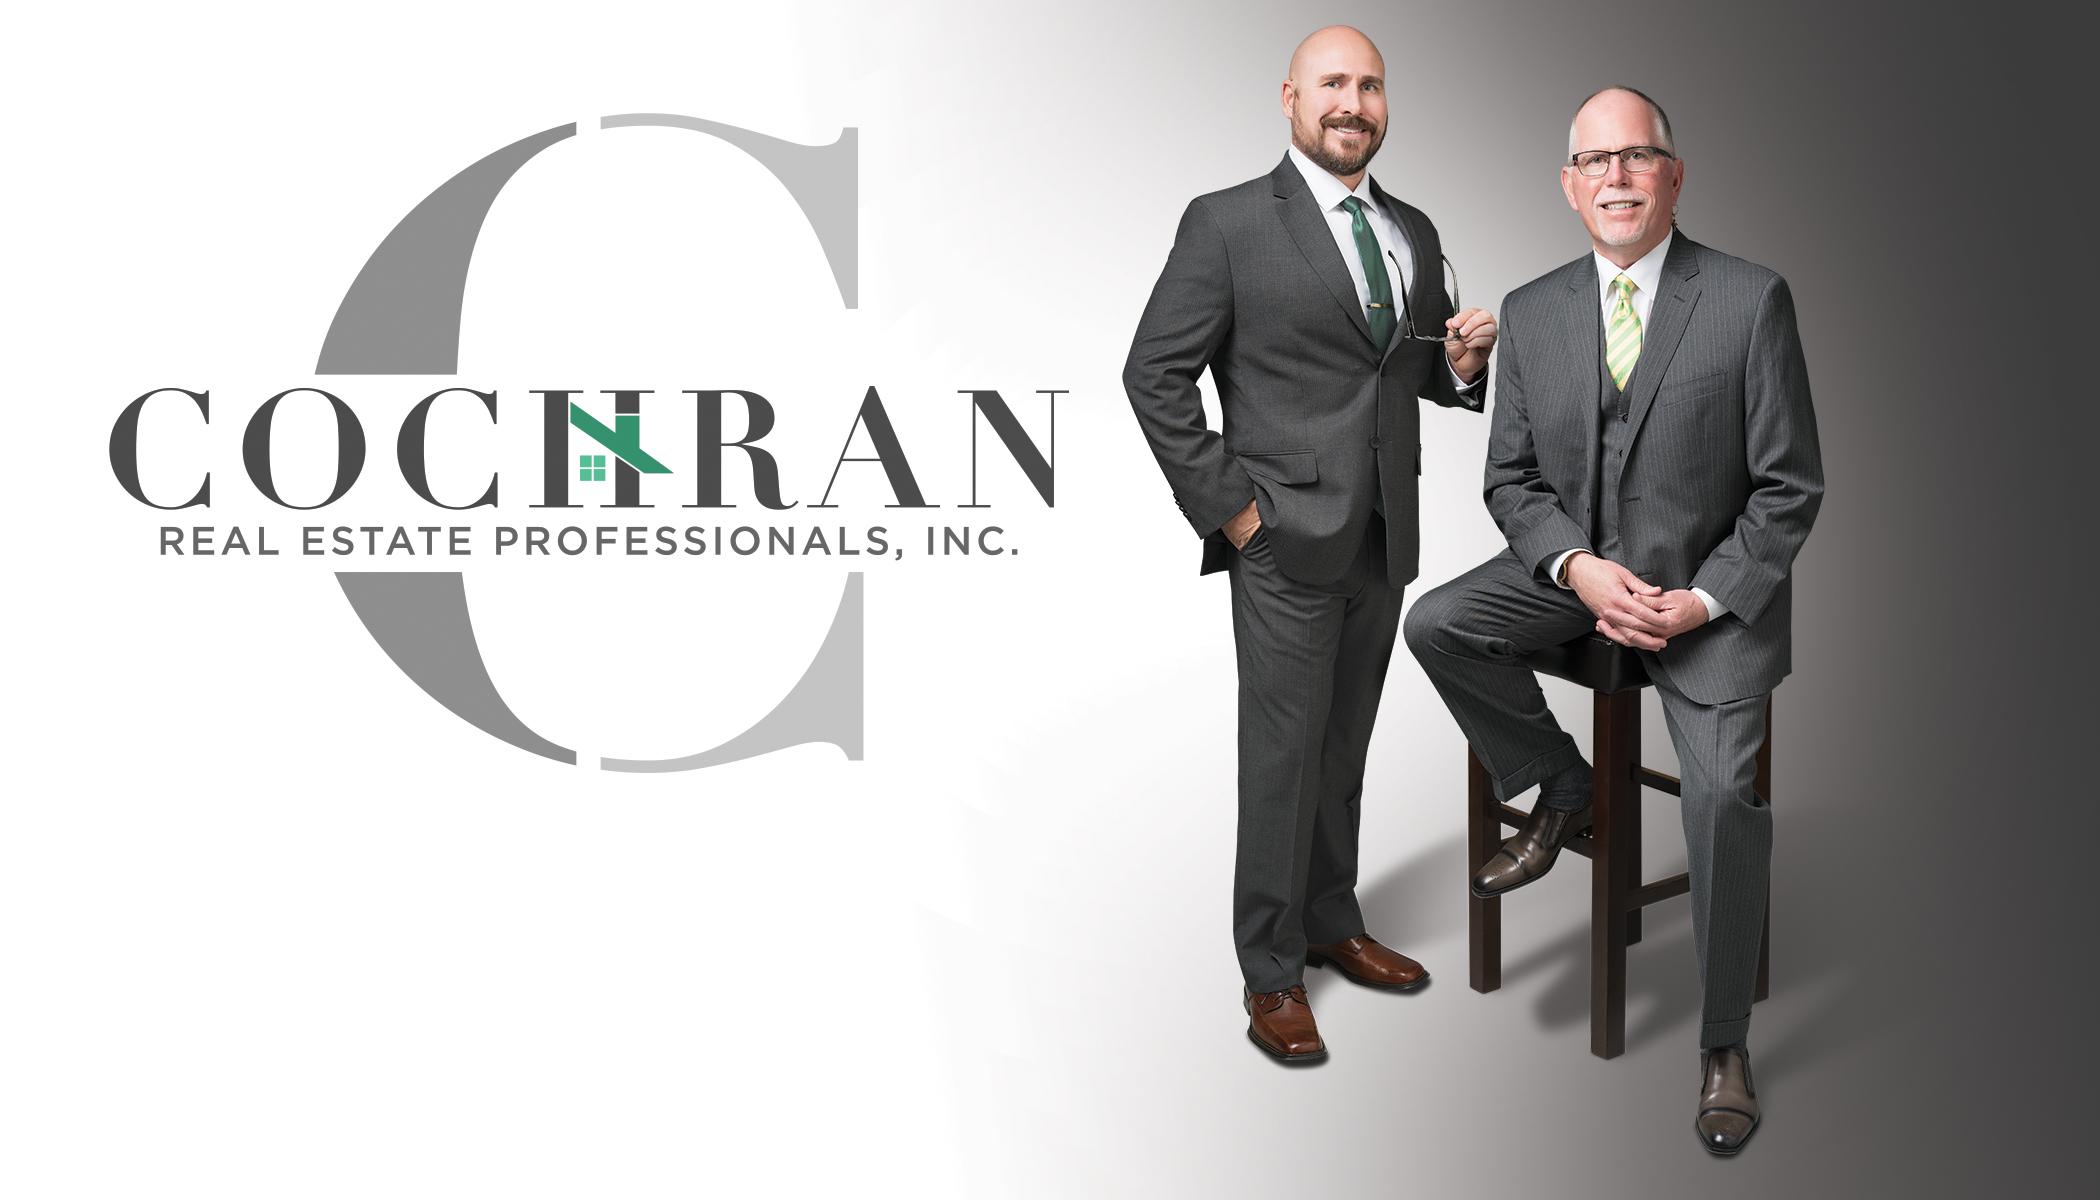 Cochran Team Branding 01.jpg